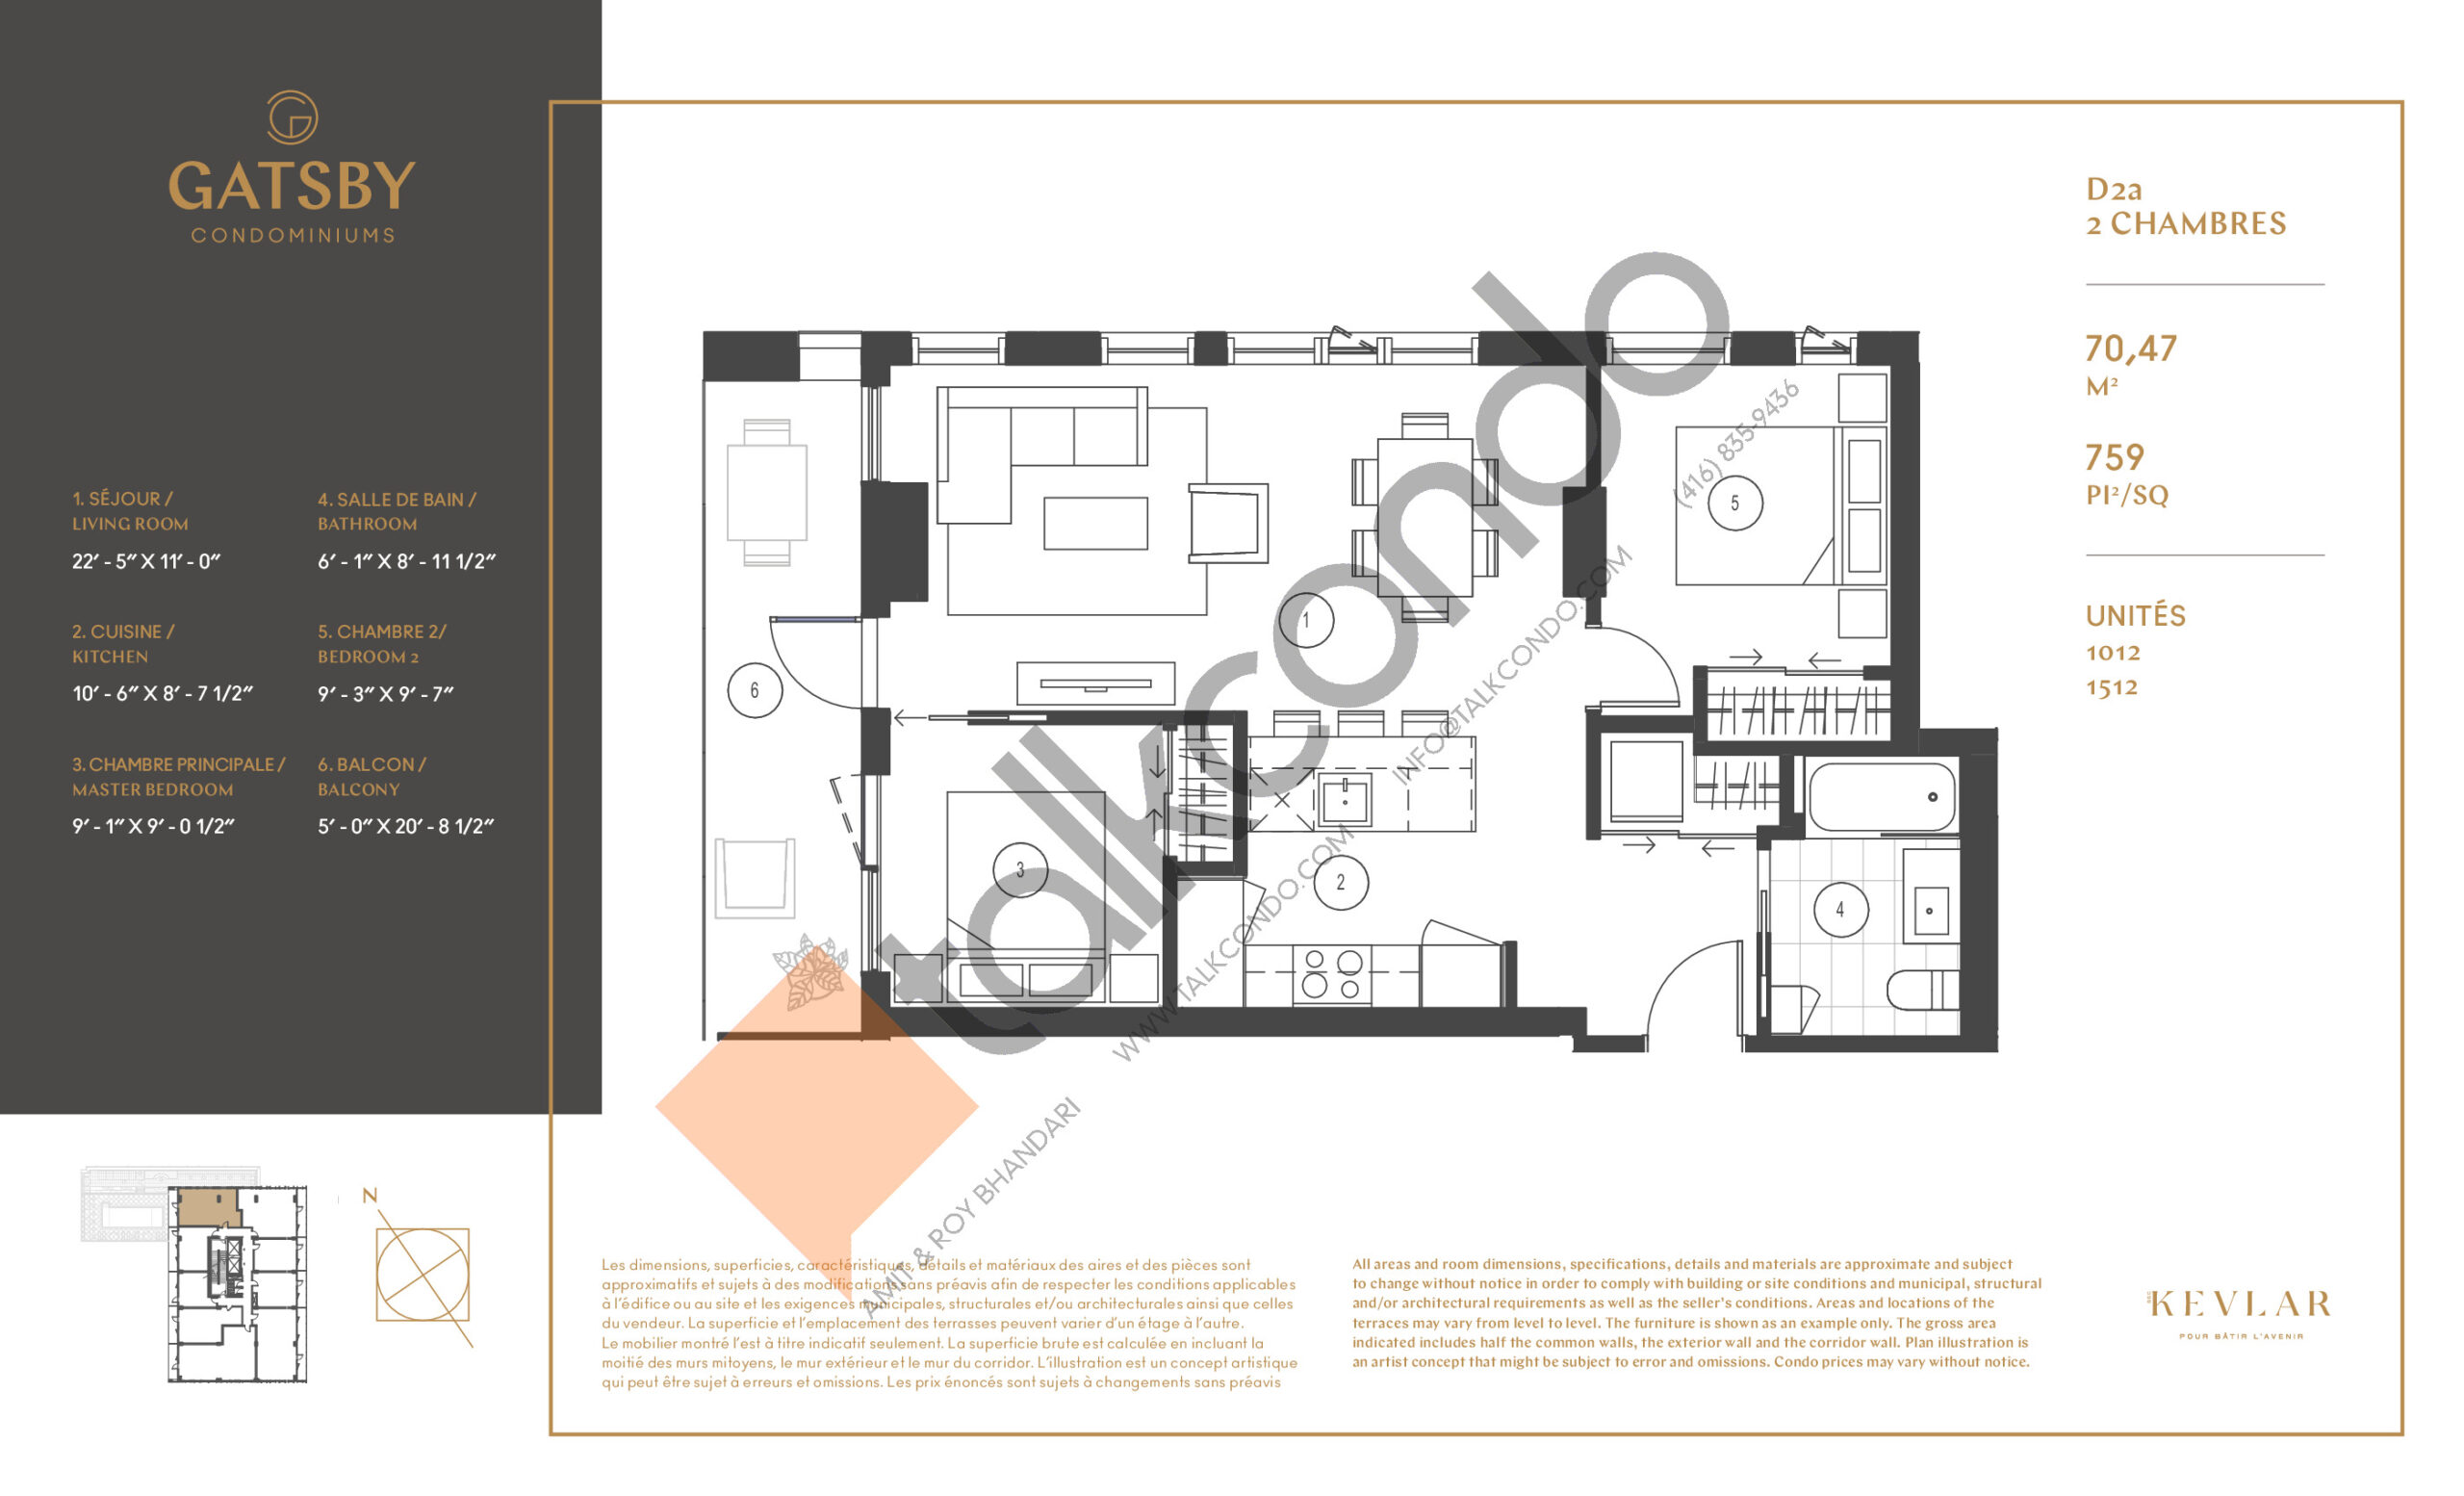 D2a Floor Plan at Gatsby Condos - 759 sq.ft